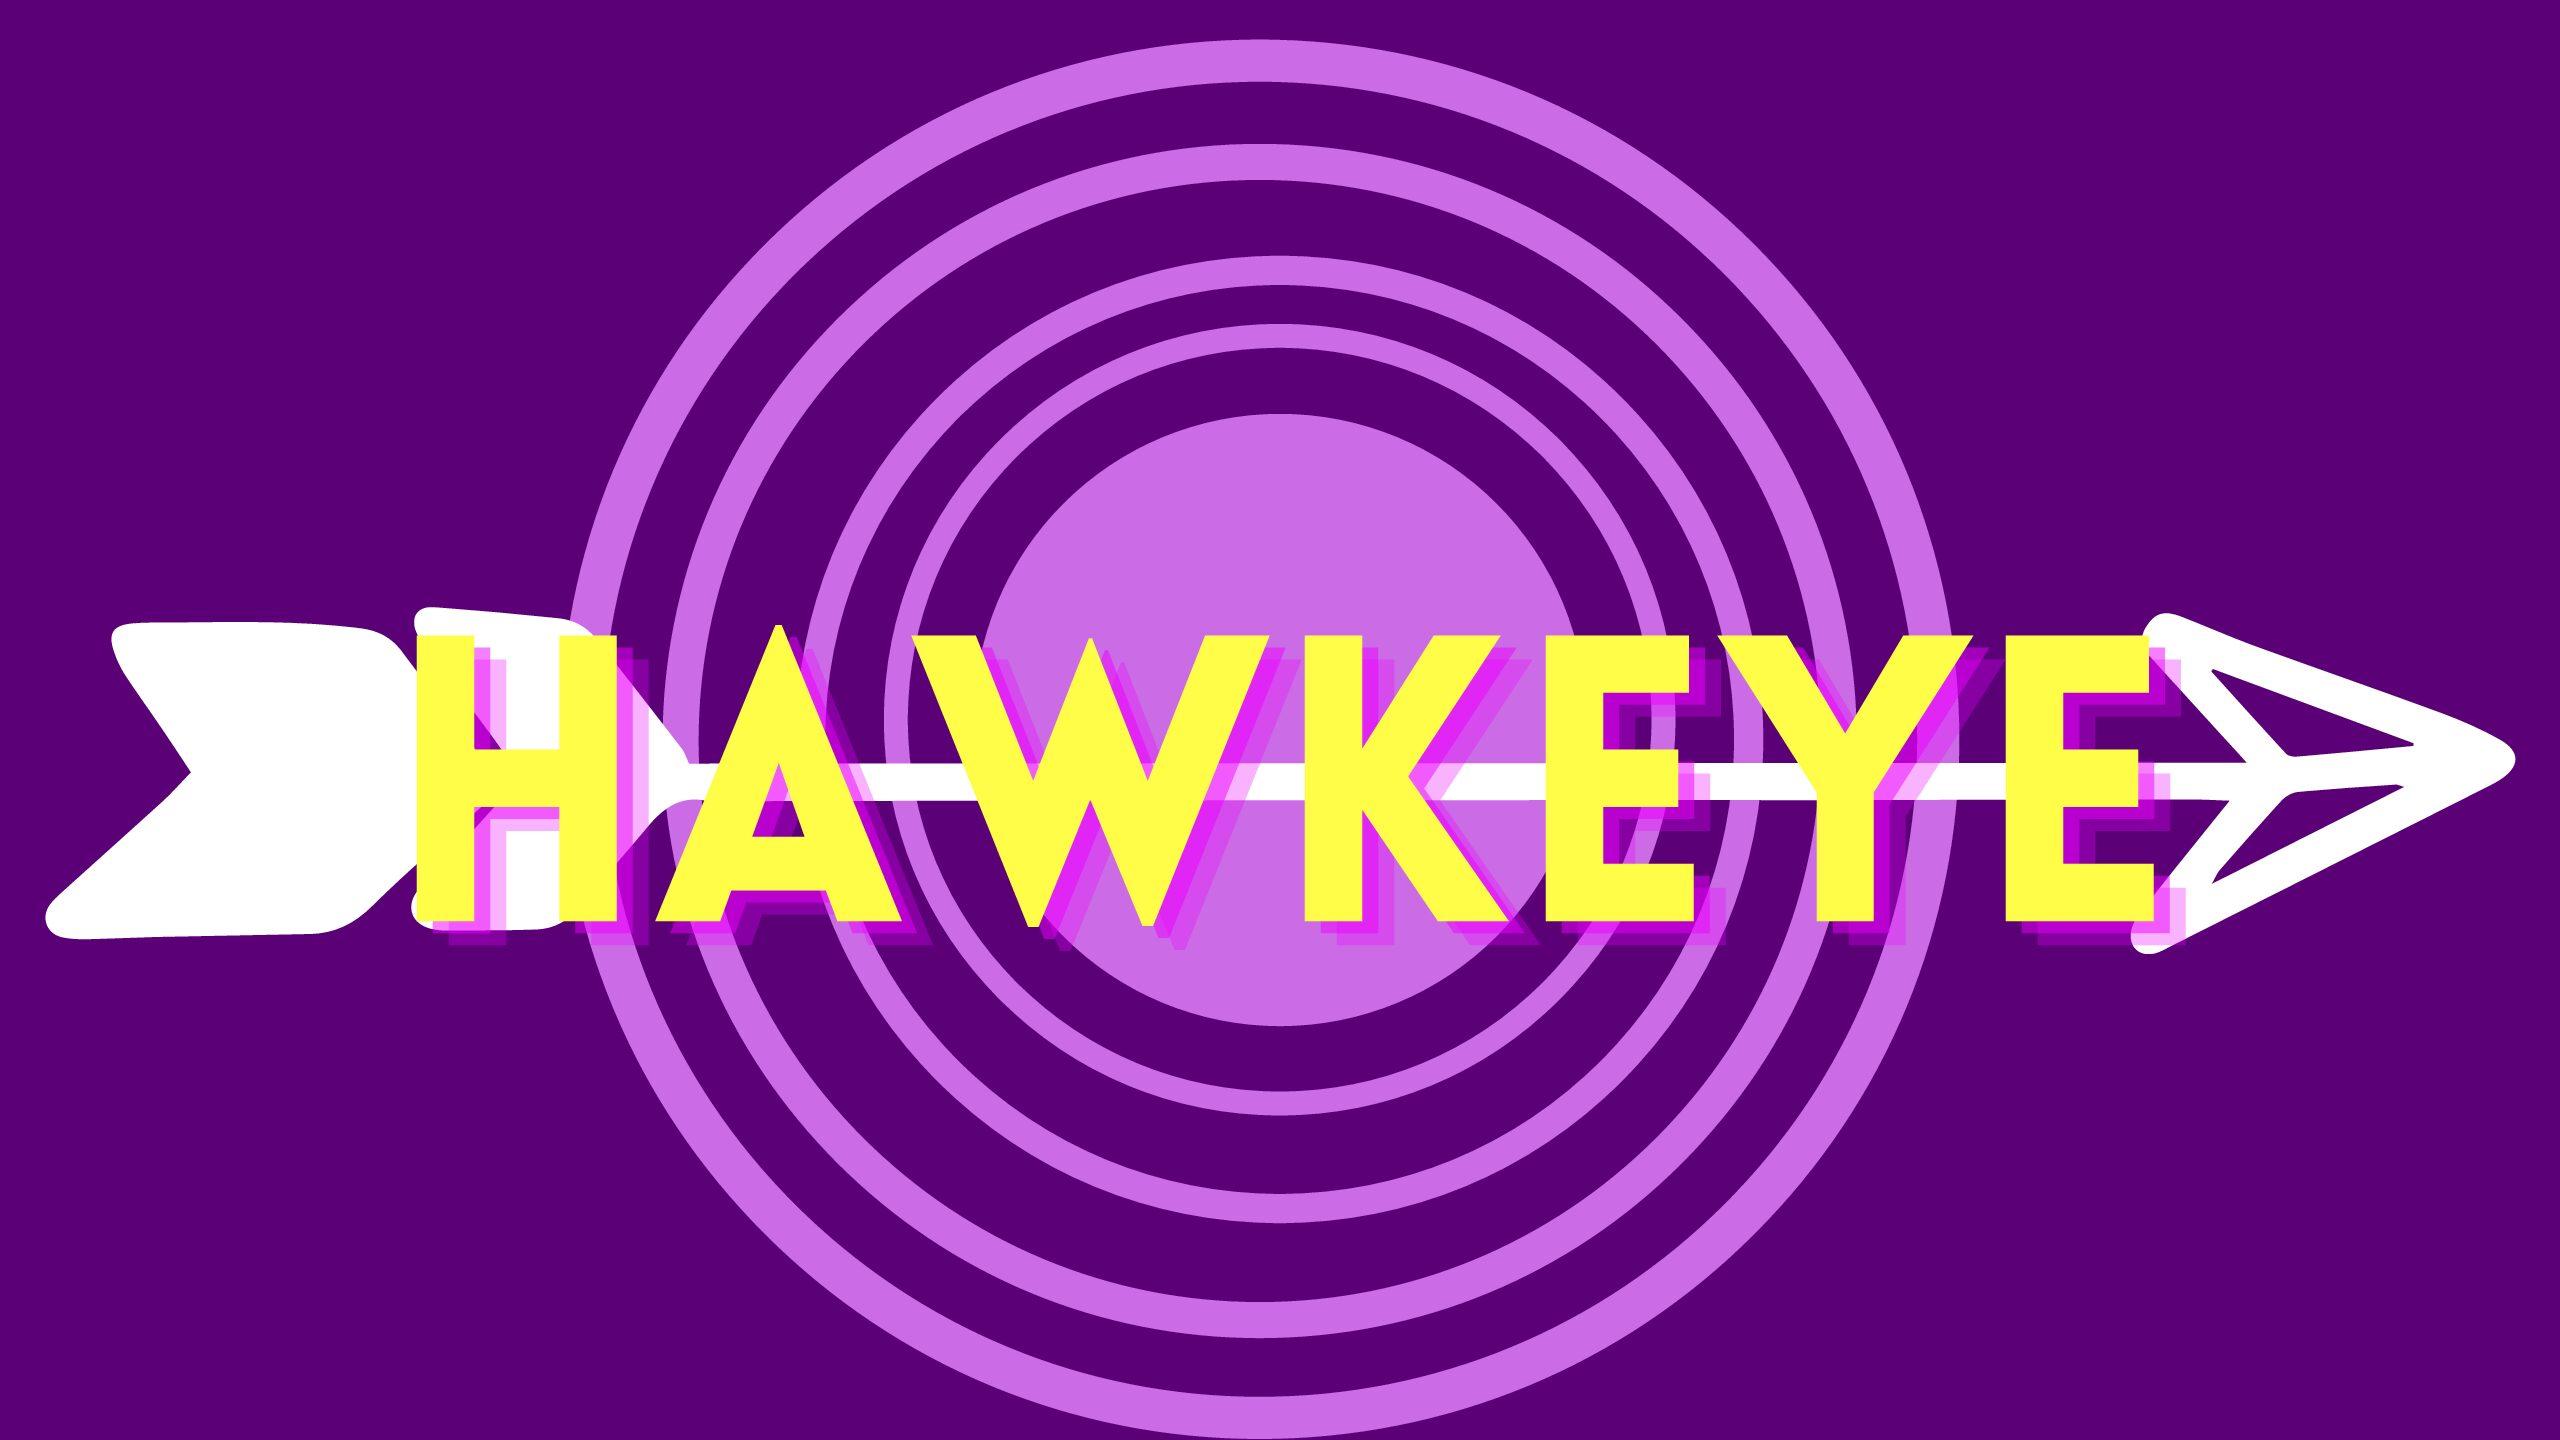 Hawkeye Trailer Hits the Target